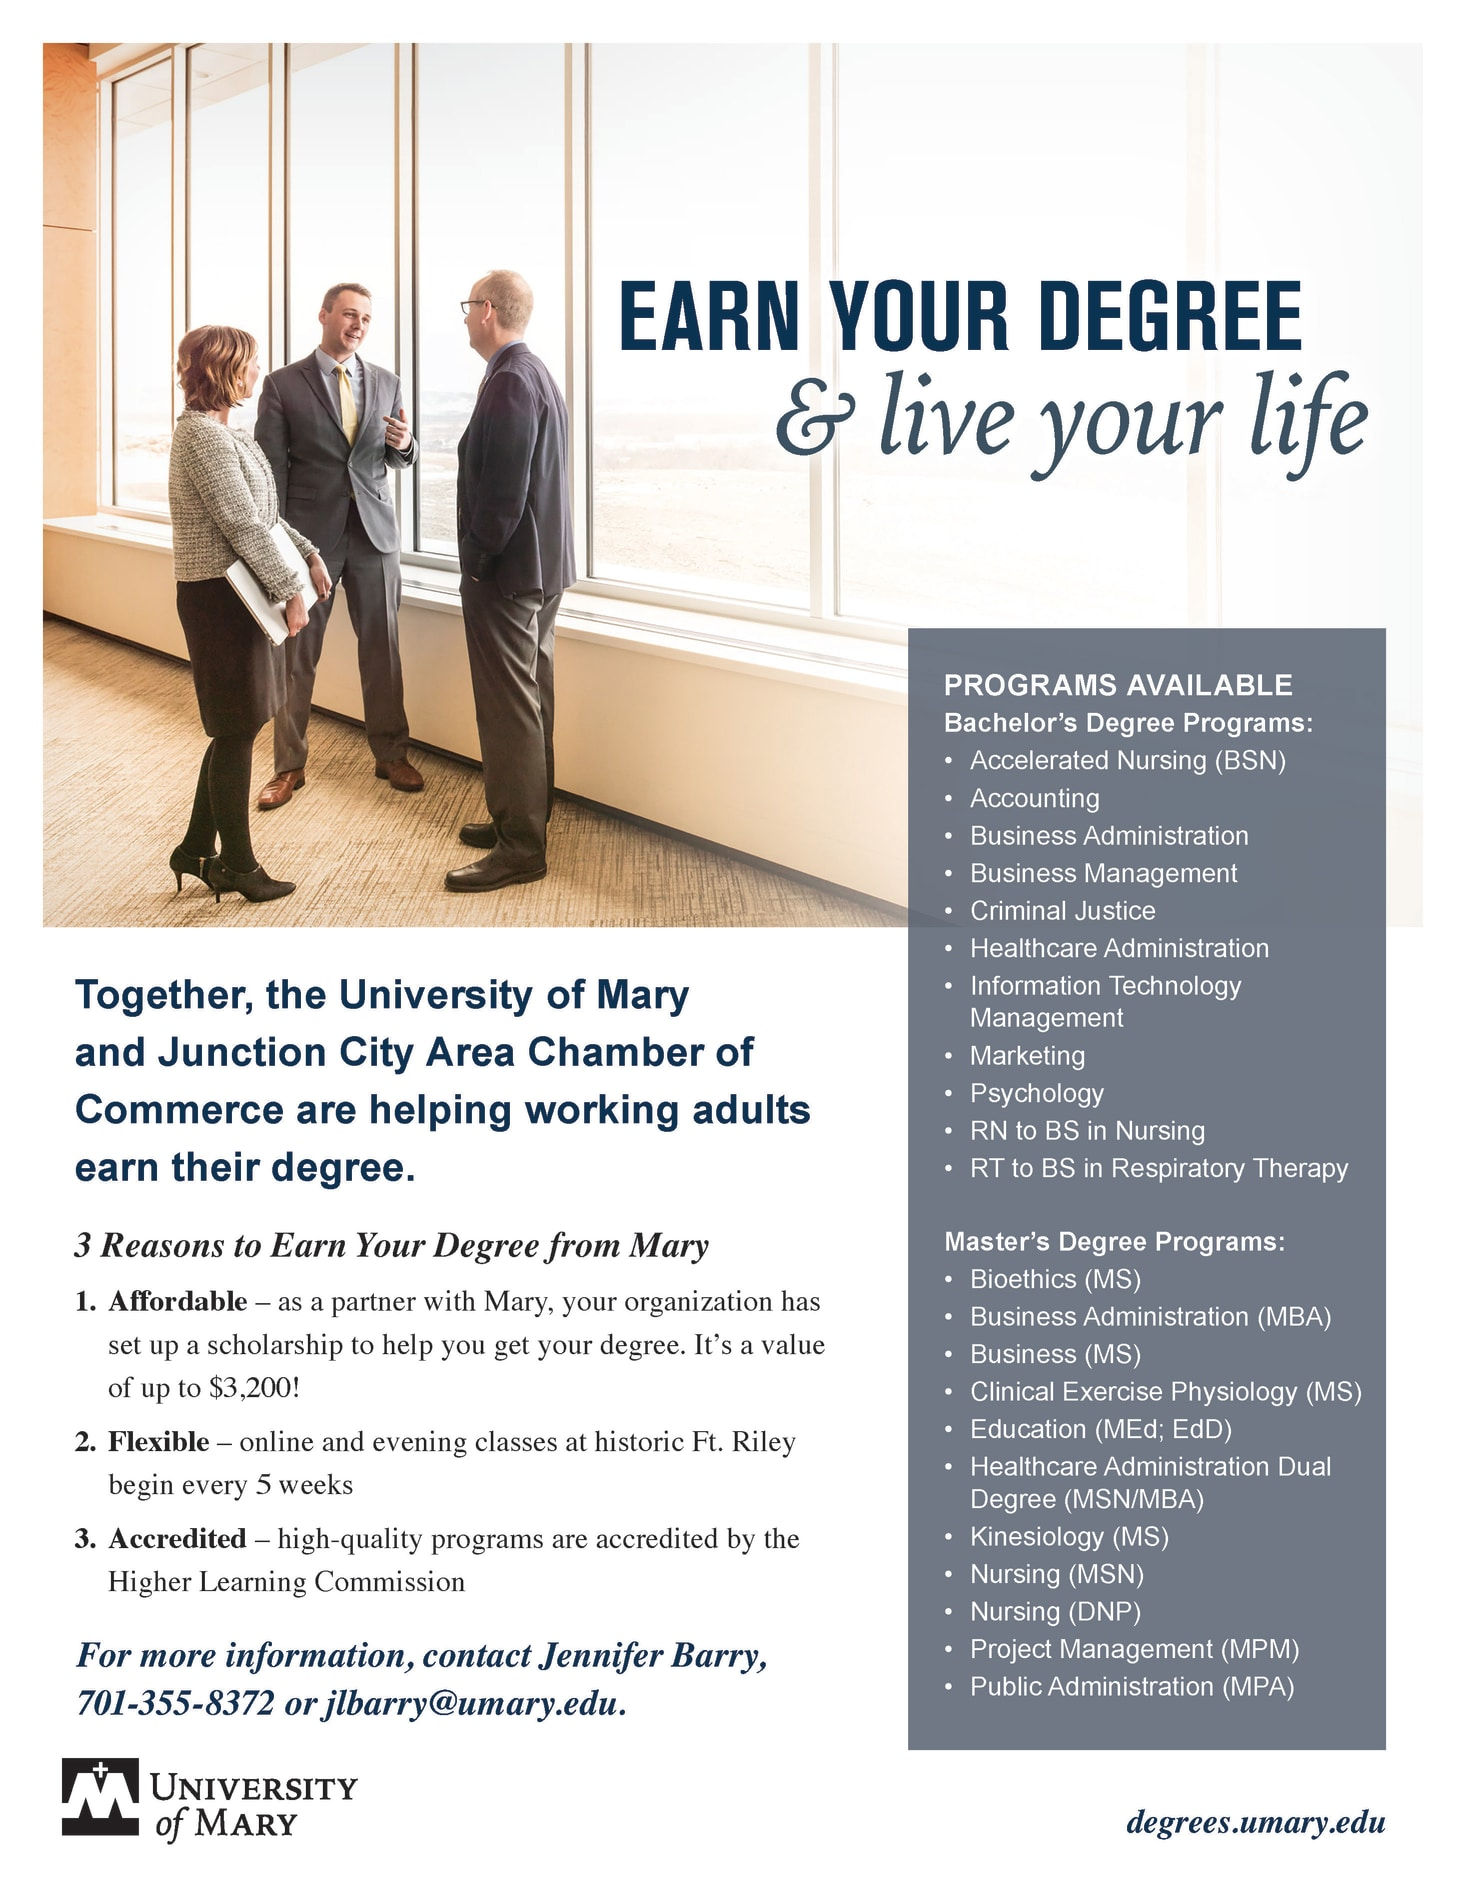 University-of-Mary-Partnership-w1466.jpg